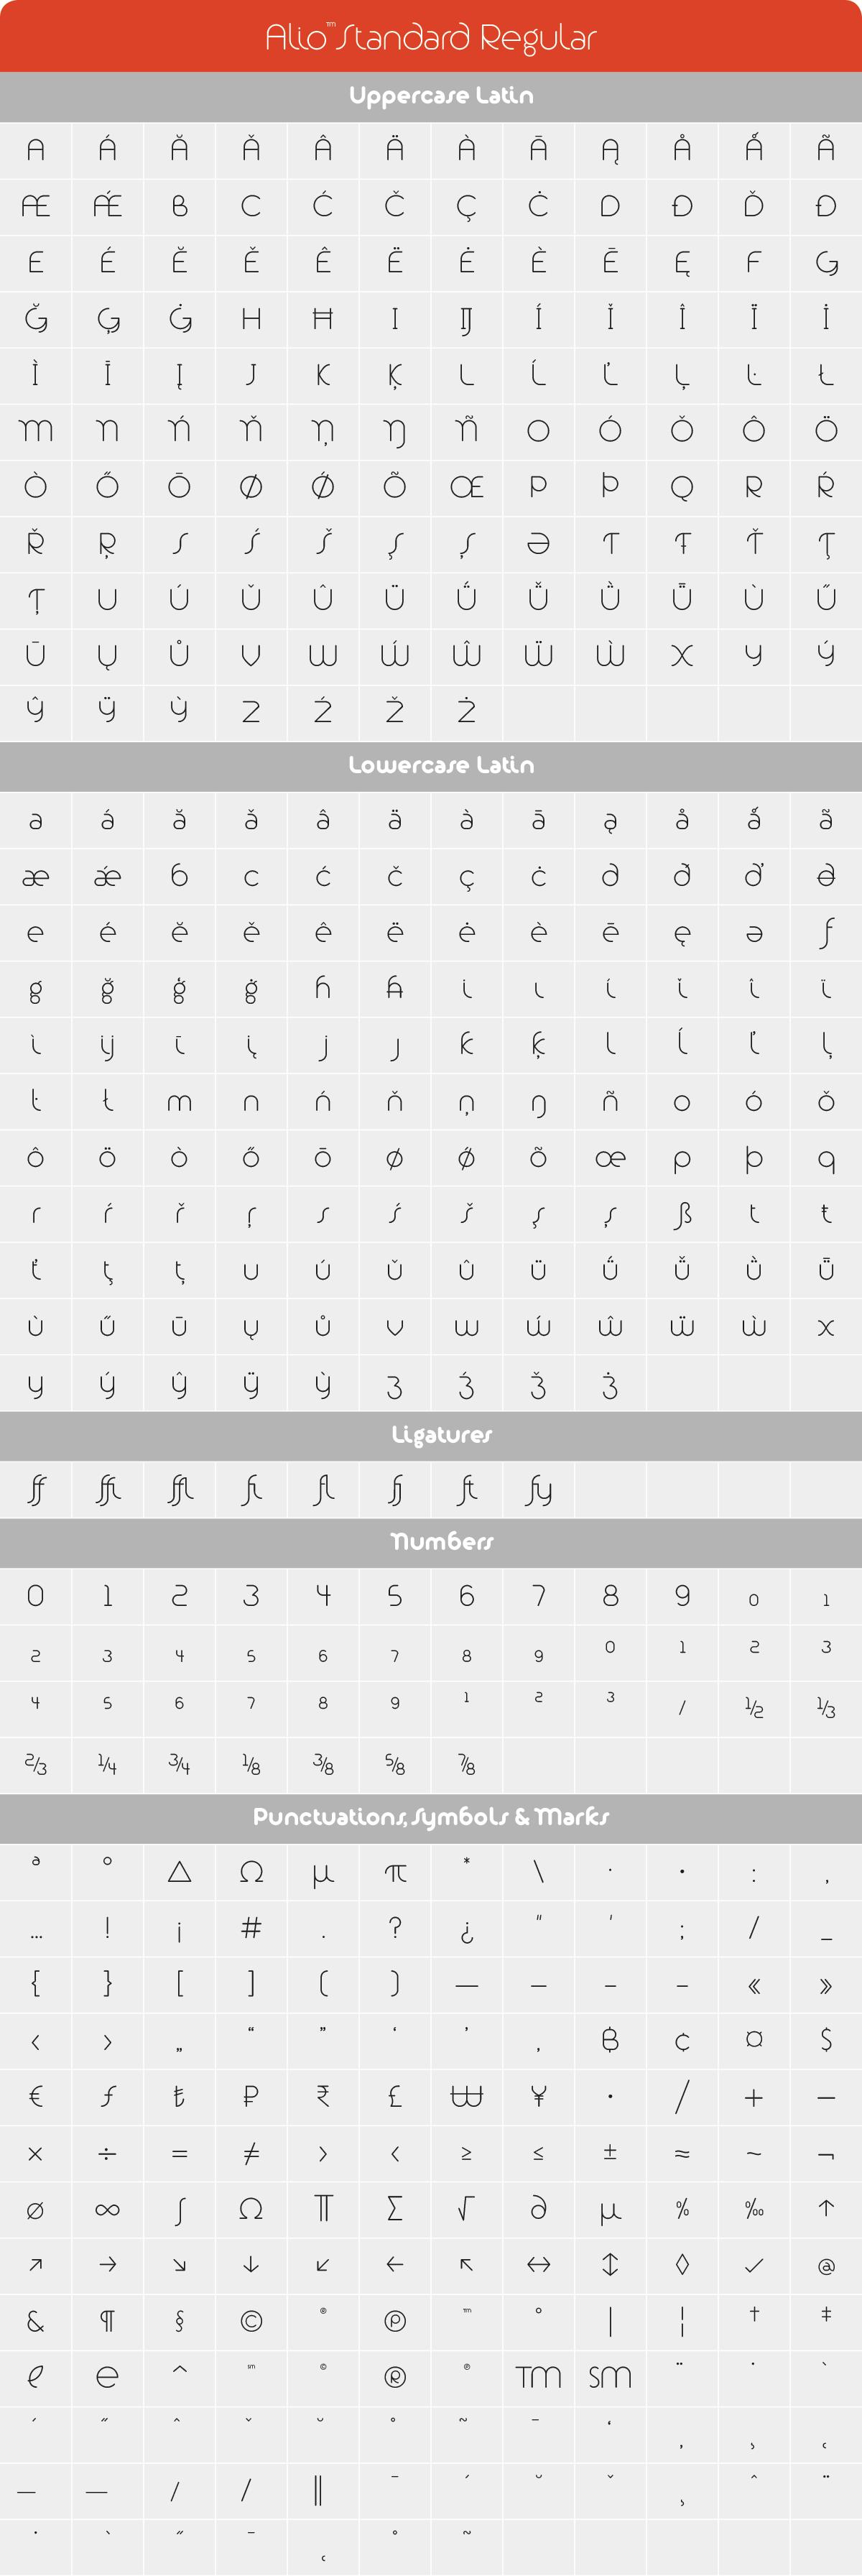 Alio Std Regular Glyph Set